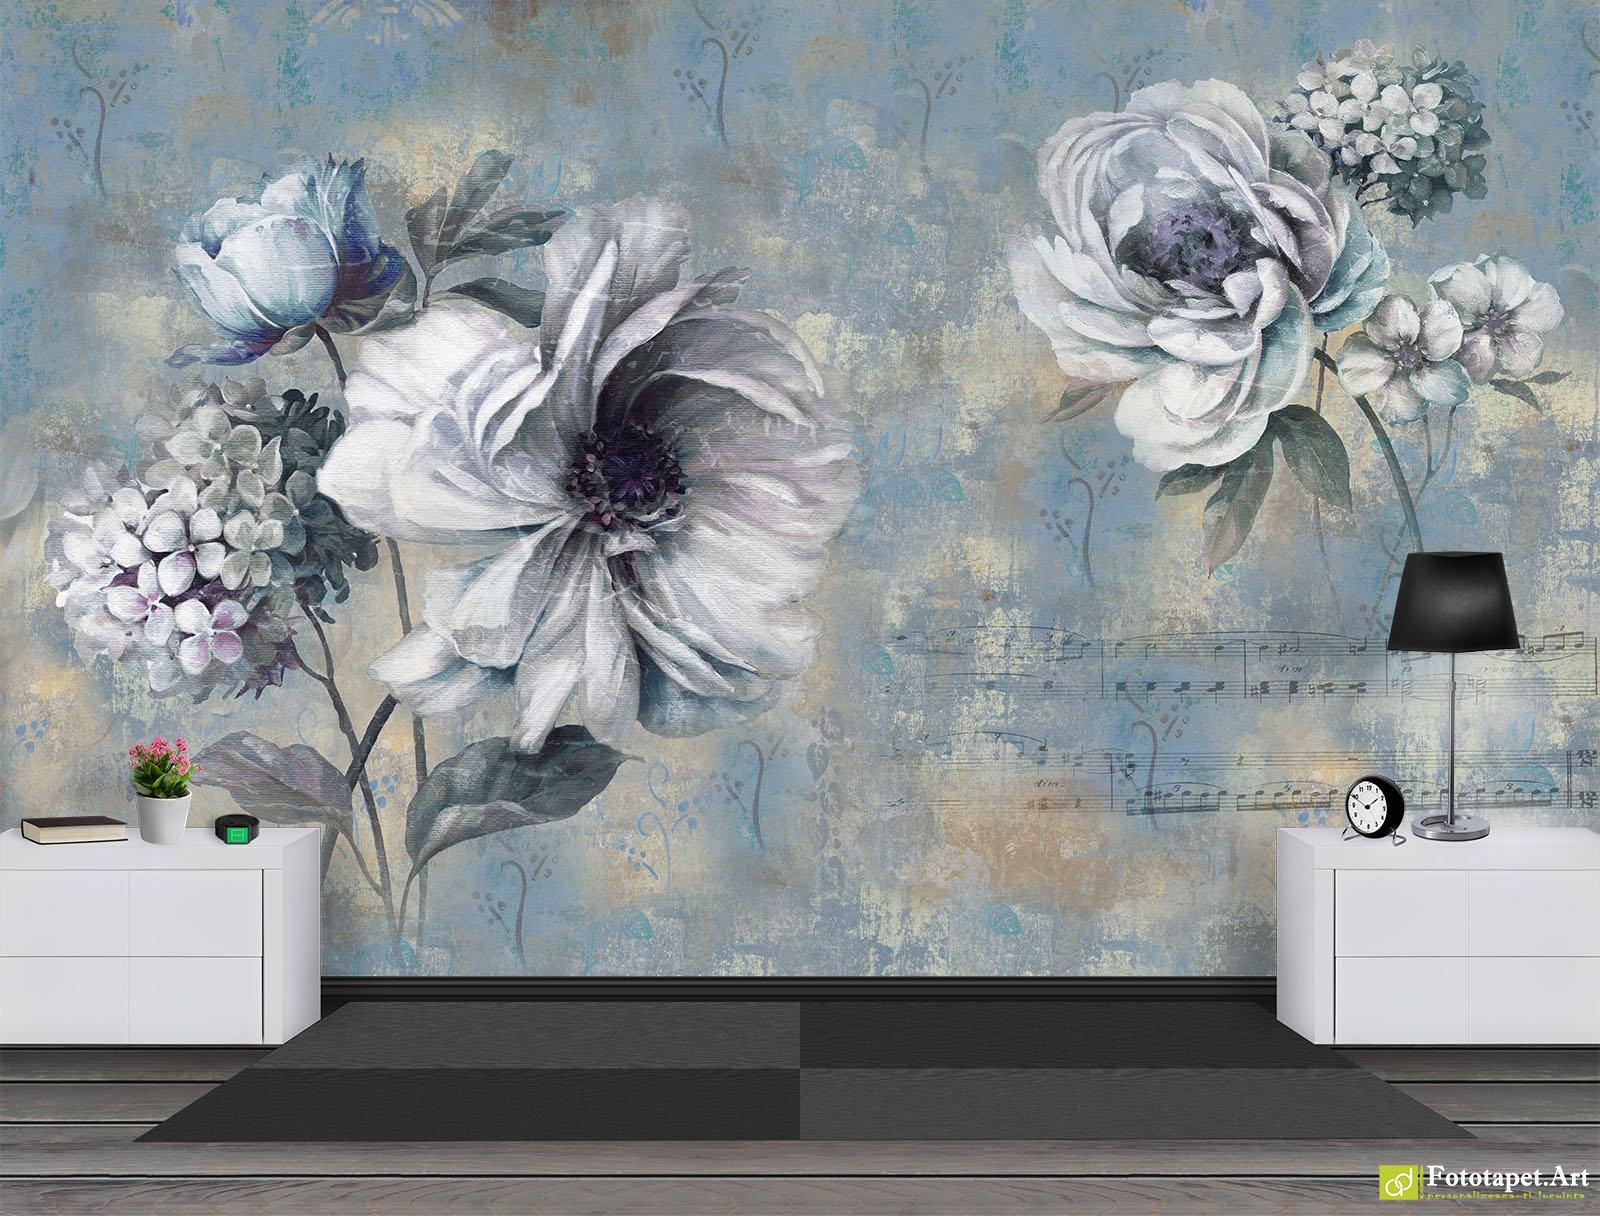 Wall Mural Vintage - HD Wallpaper